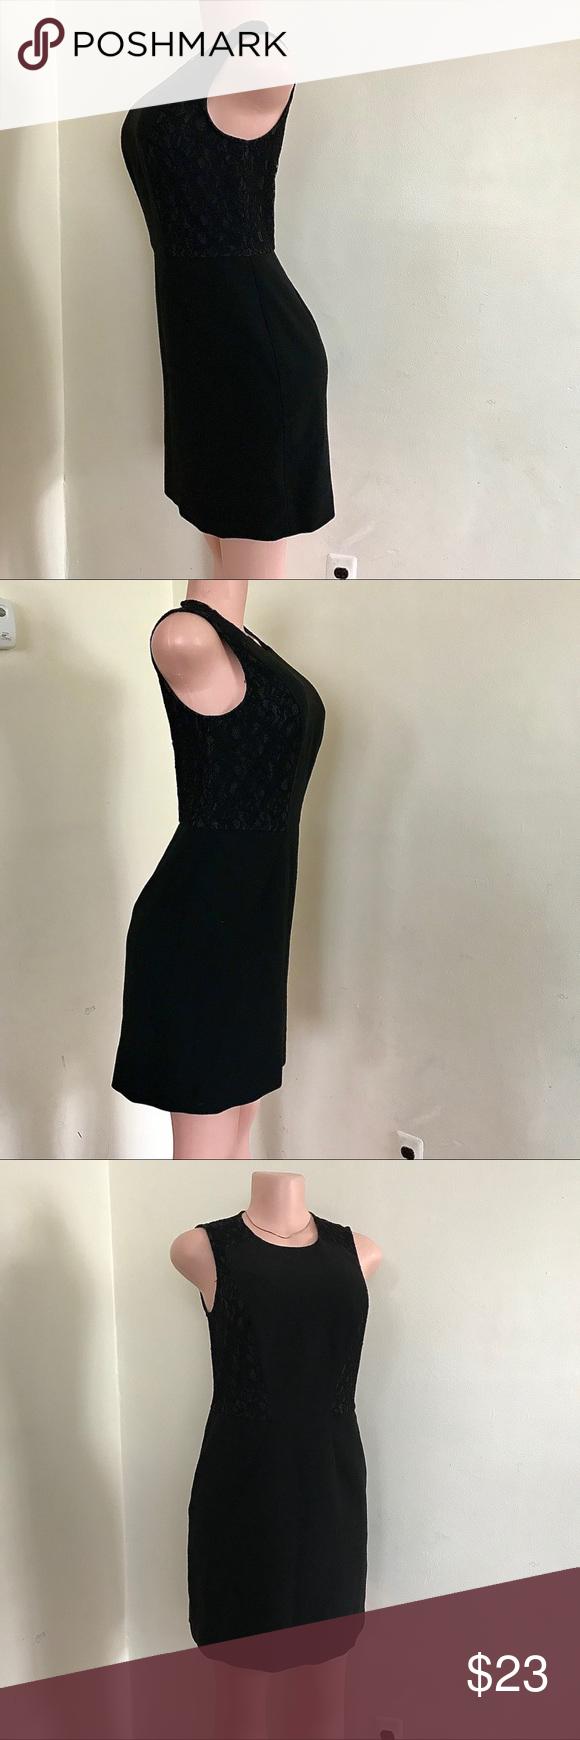 Ann Taylor Black Lace Dress Sz 4 Casual Cocktail Dress Black Short Sleeve Dress Black Lace Dress [ 1740 x 580 Pixel ]